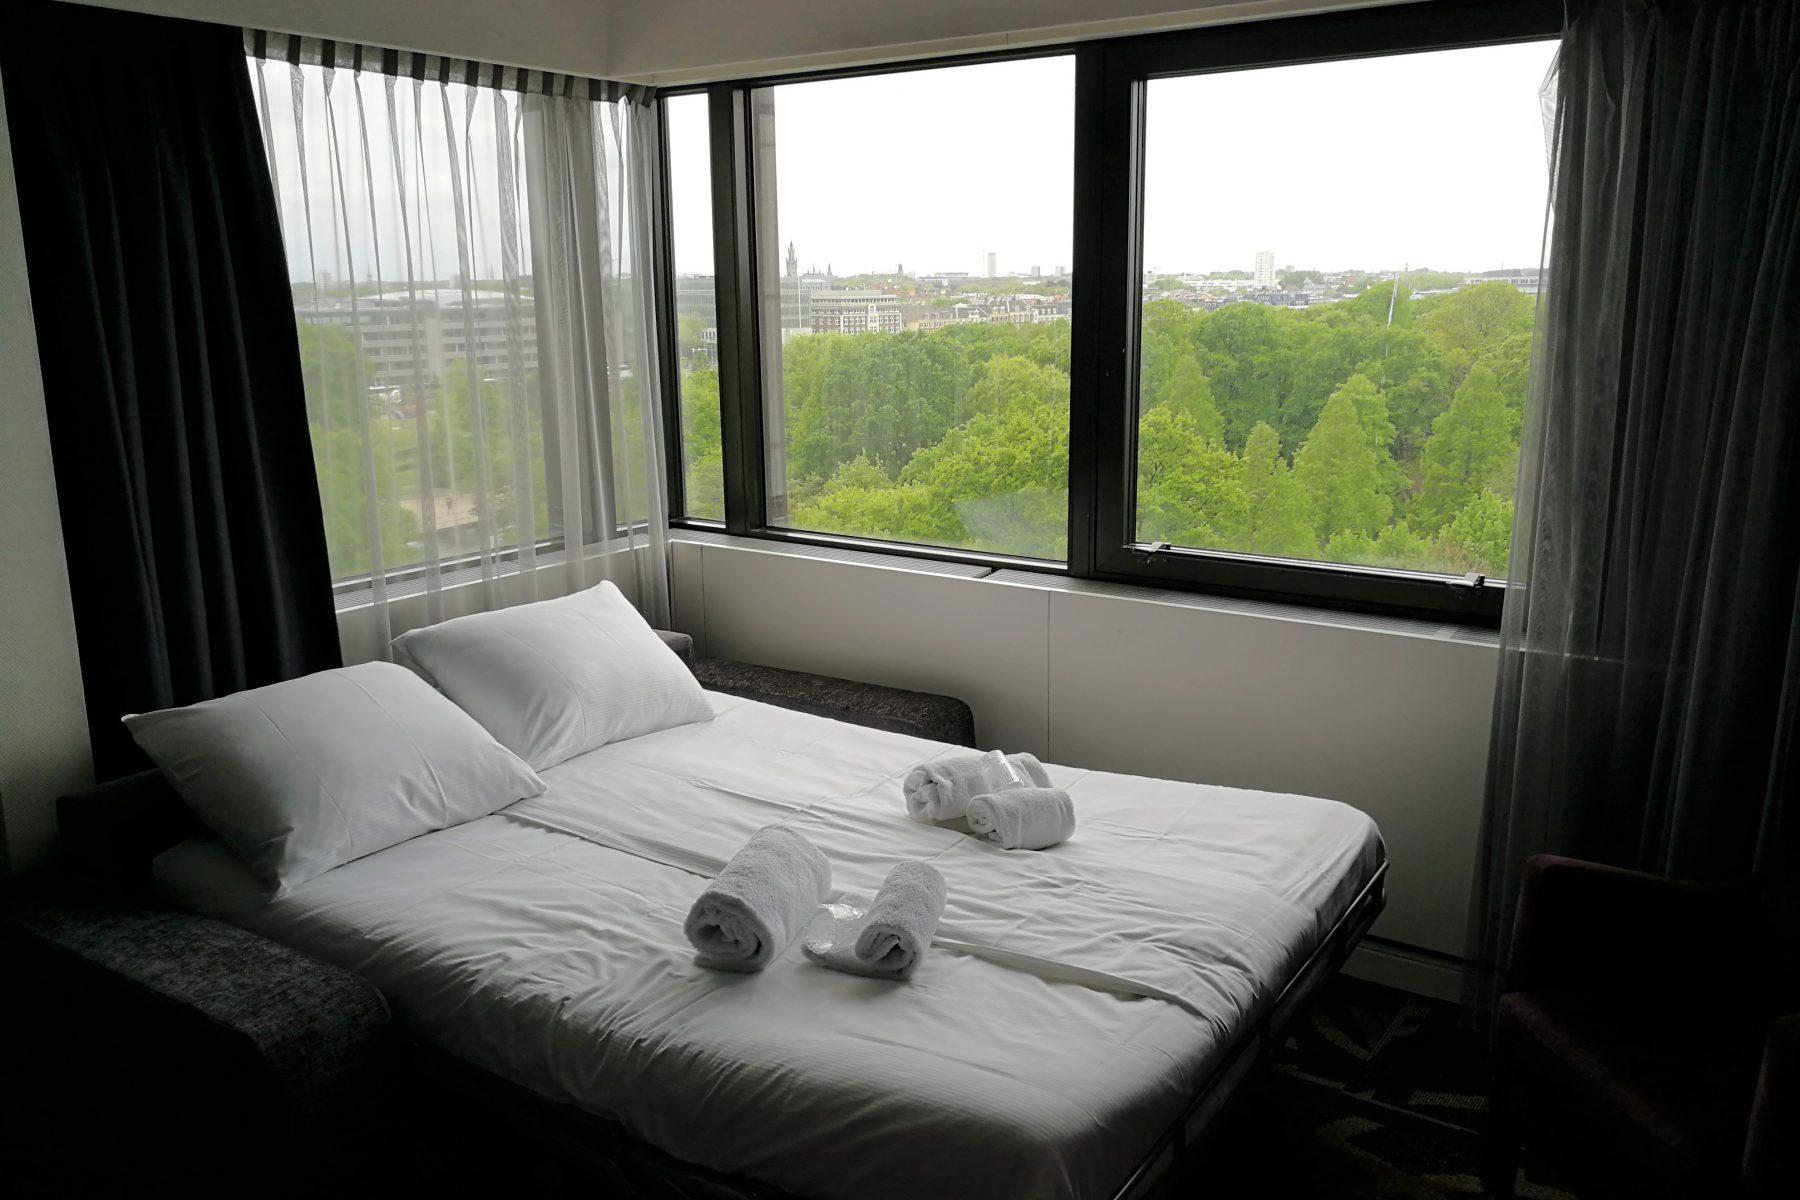 Hotel Babylon bed 1 kids